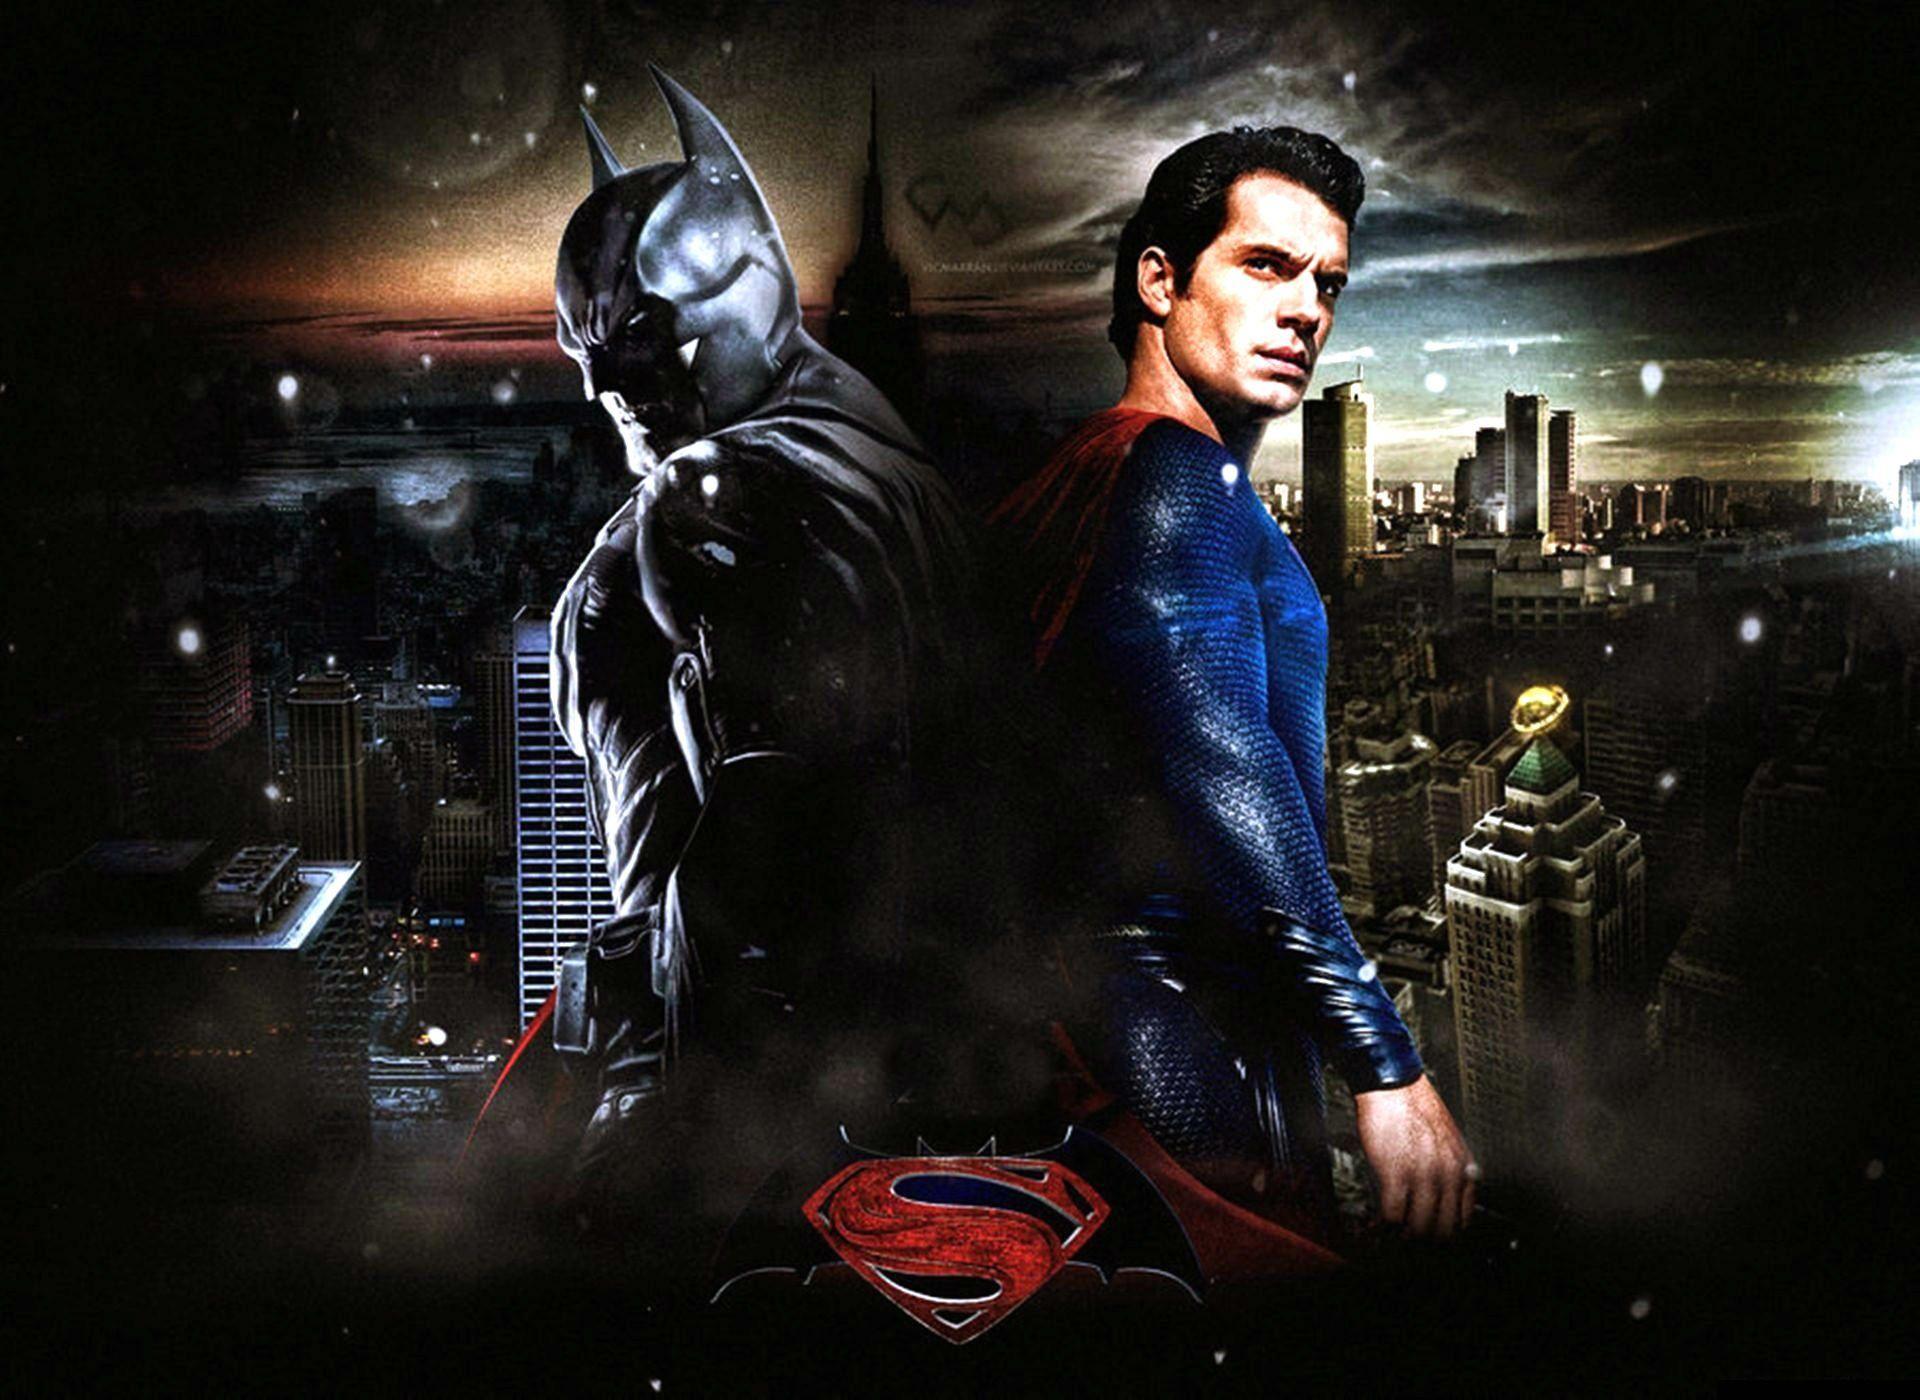 batman vs superman dawn of justice movie wonder woman 2560x1440 my style pinterest wonder woman batman vs superman and movies